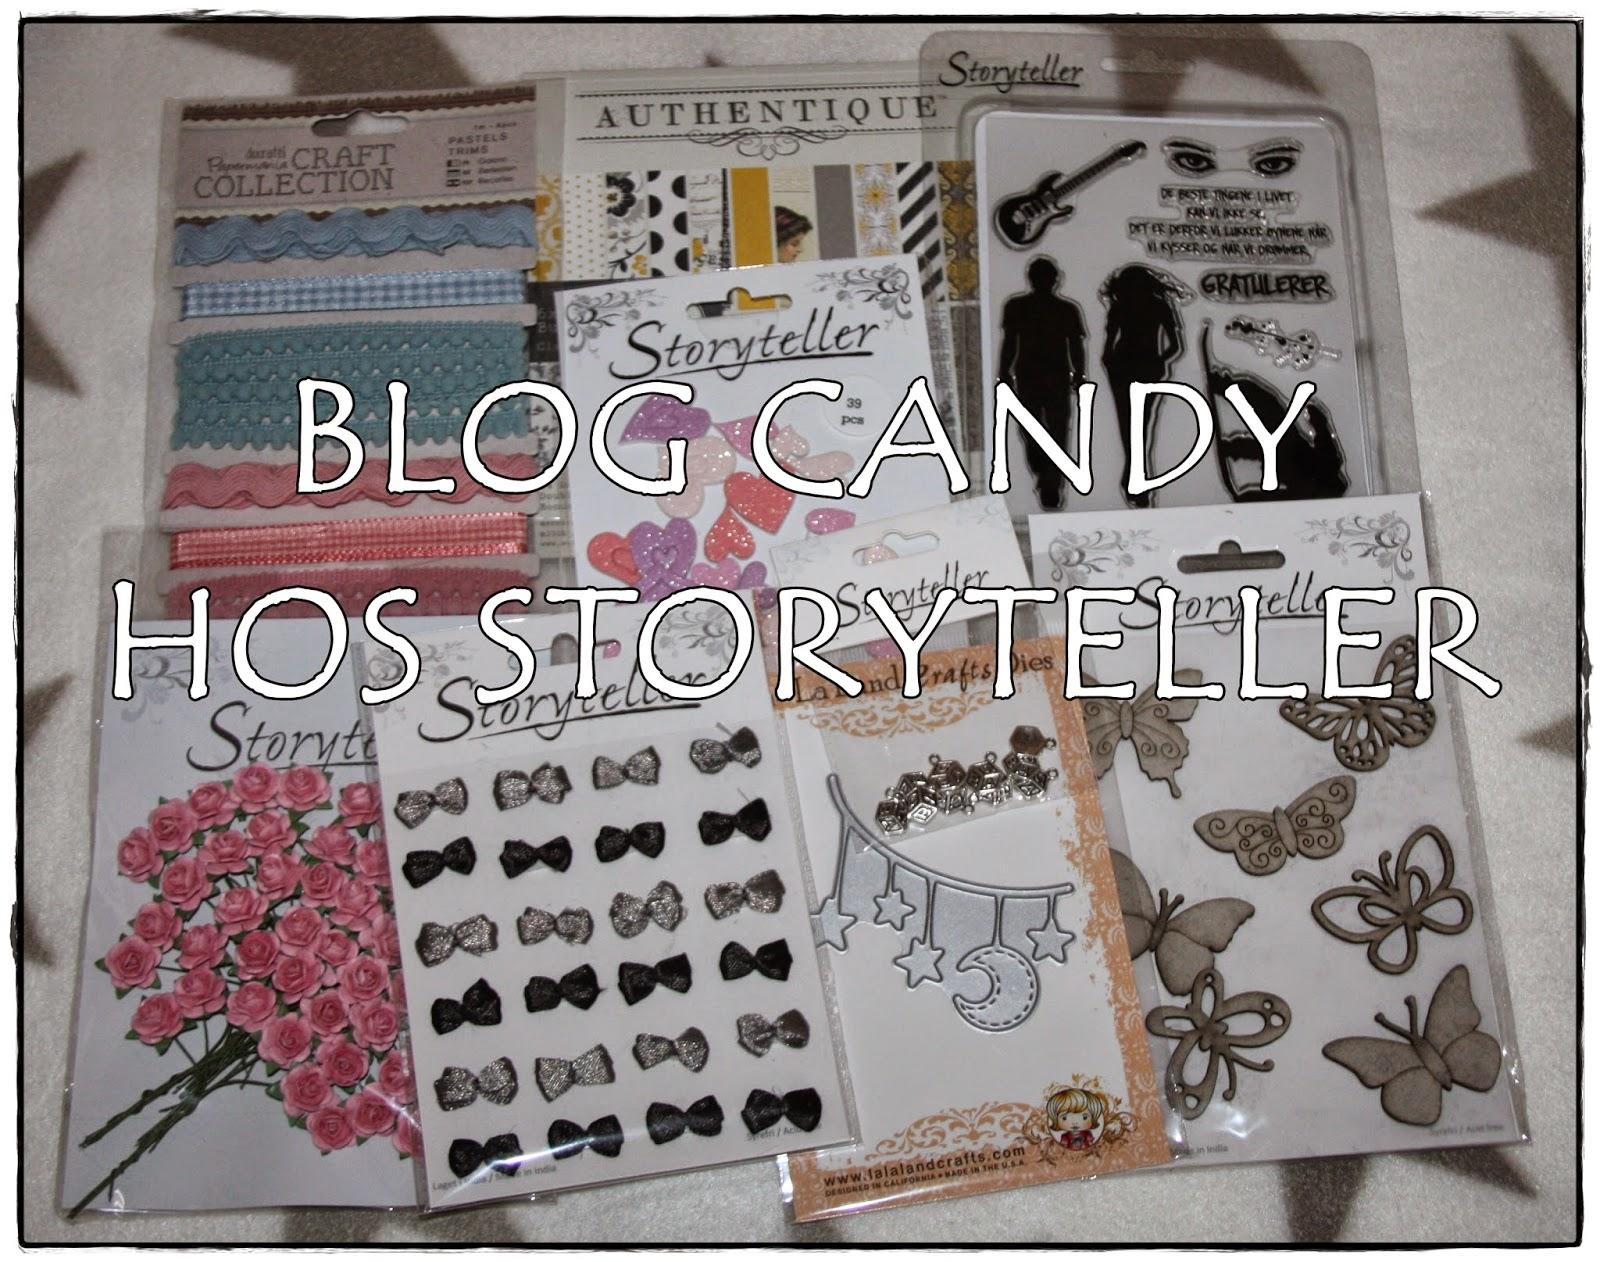 Blogcandy hos Storyteller